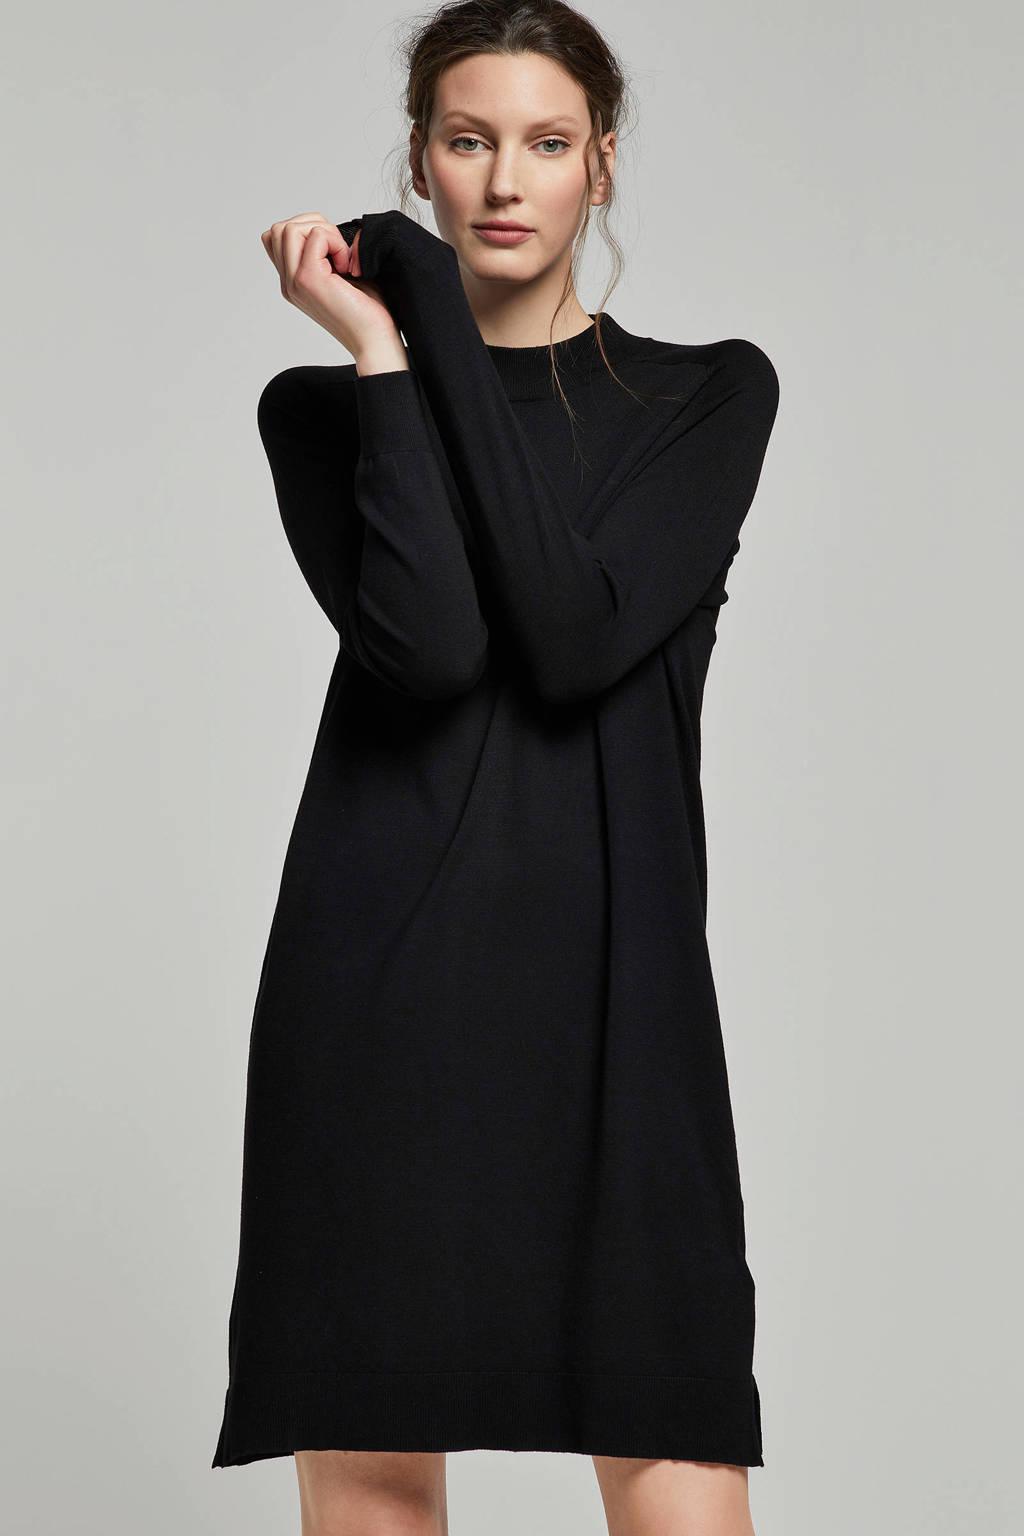 Inwear tuniek Novella zwart, Zwart